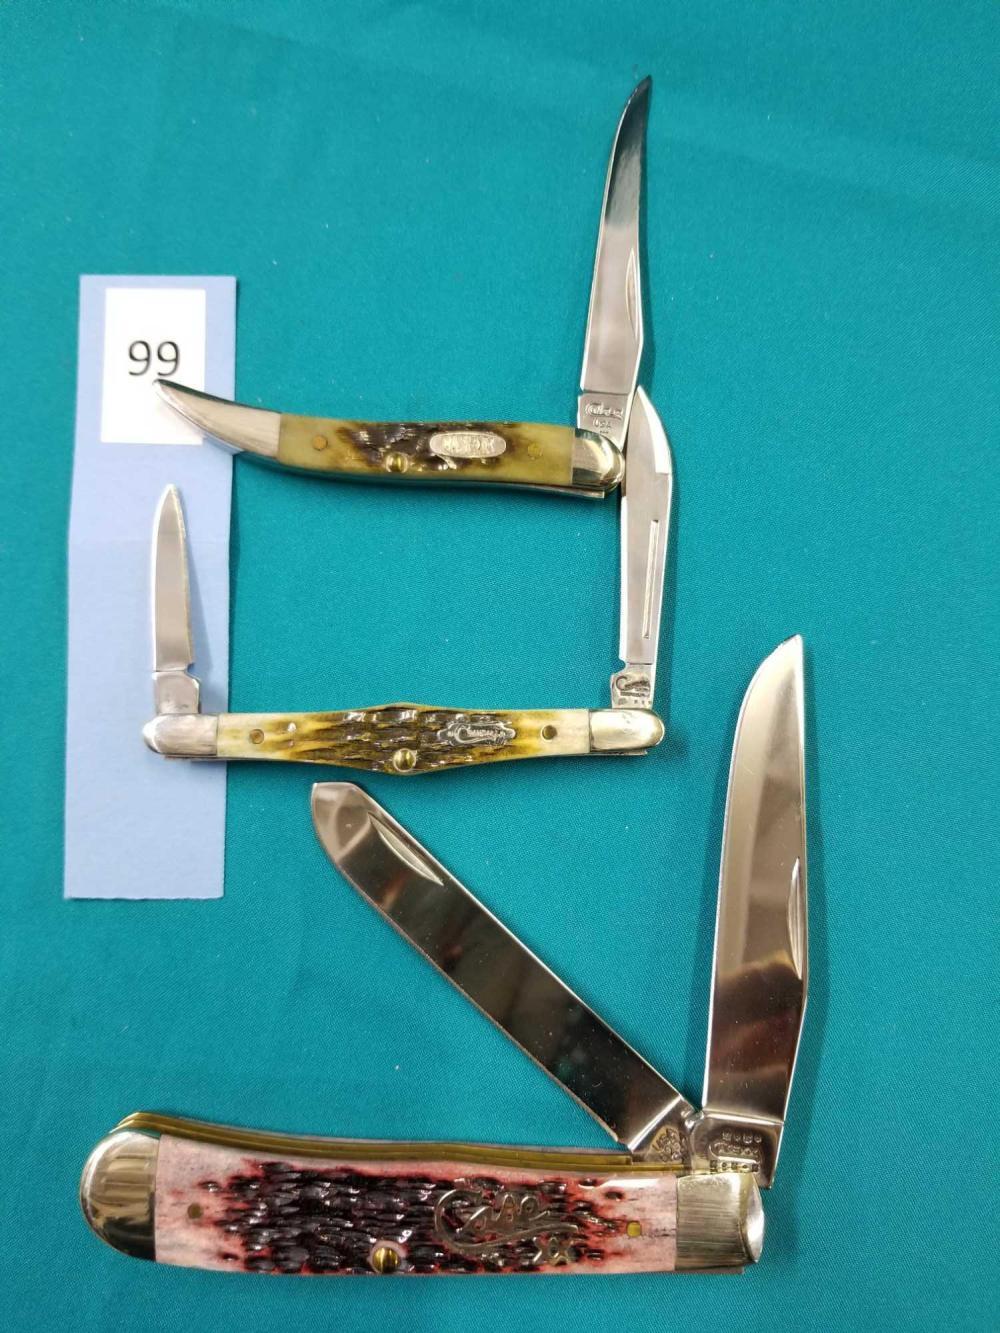 CASE & CRANDALL FOLDING POCKET KNIVES - 3 ITEMS